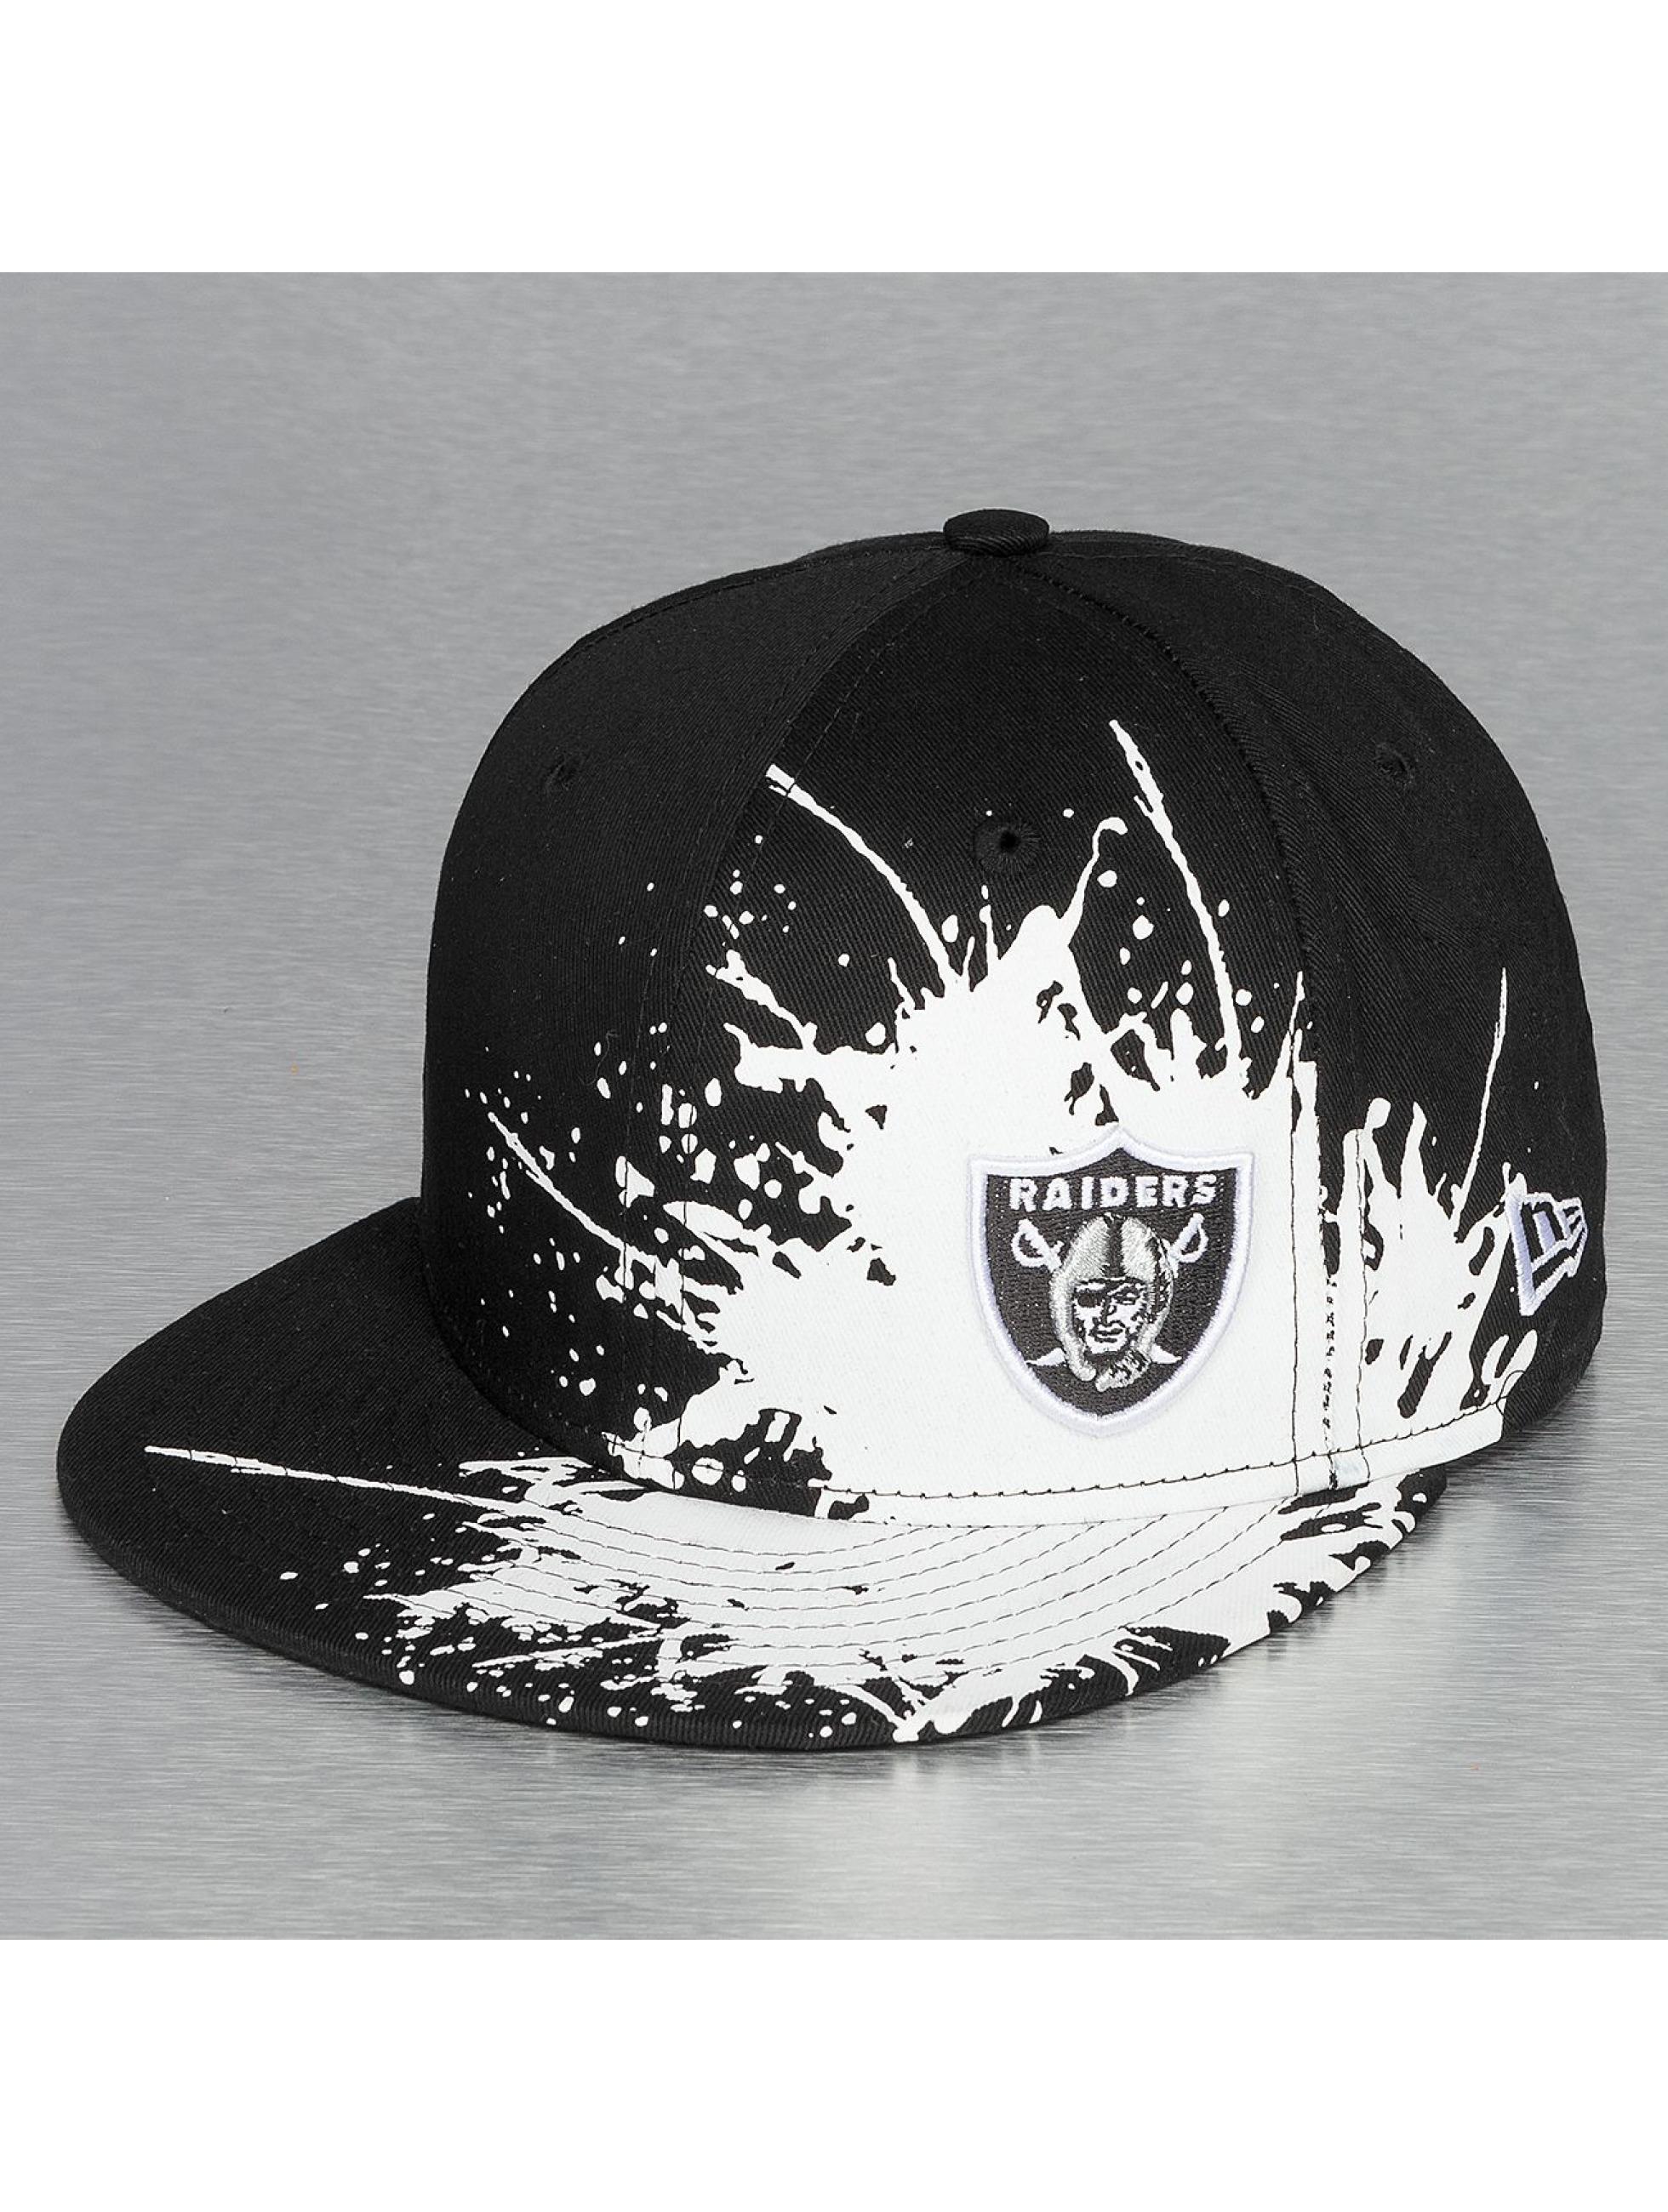 New Era Fitted Cap Splatways Flawless Oakland Raiders 59Fifty schwarz